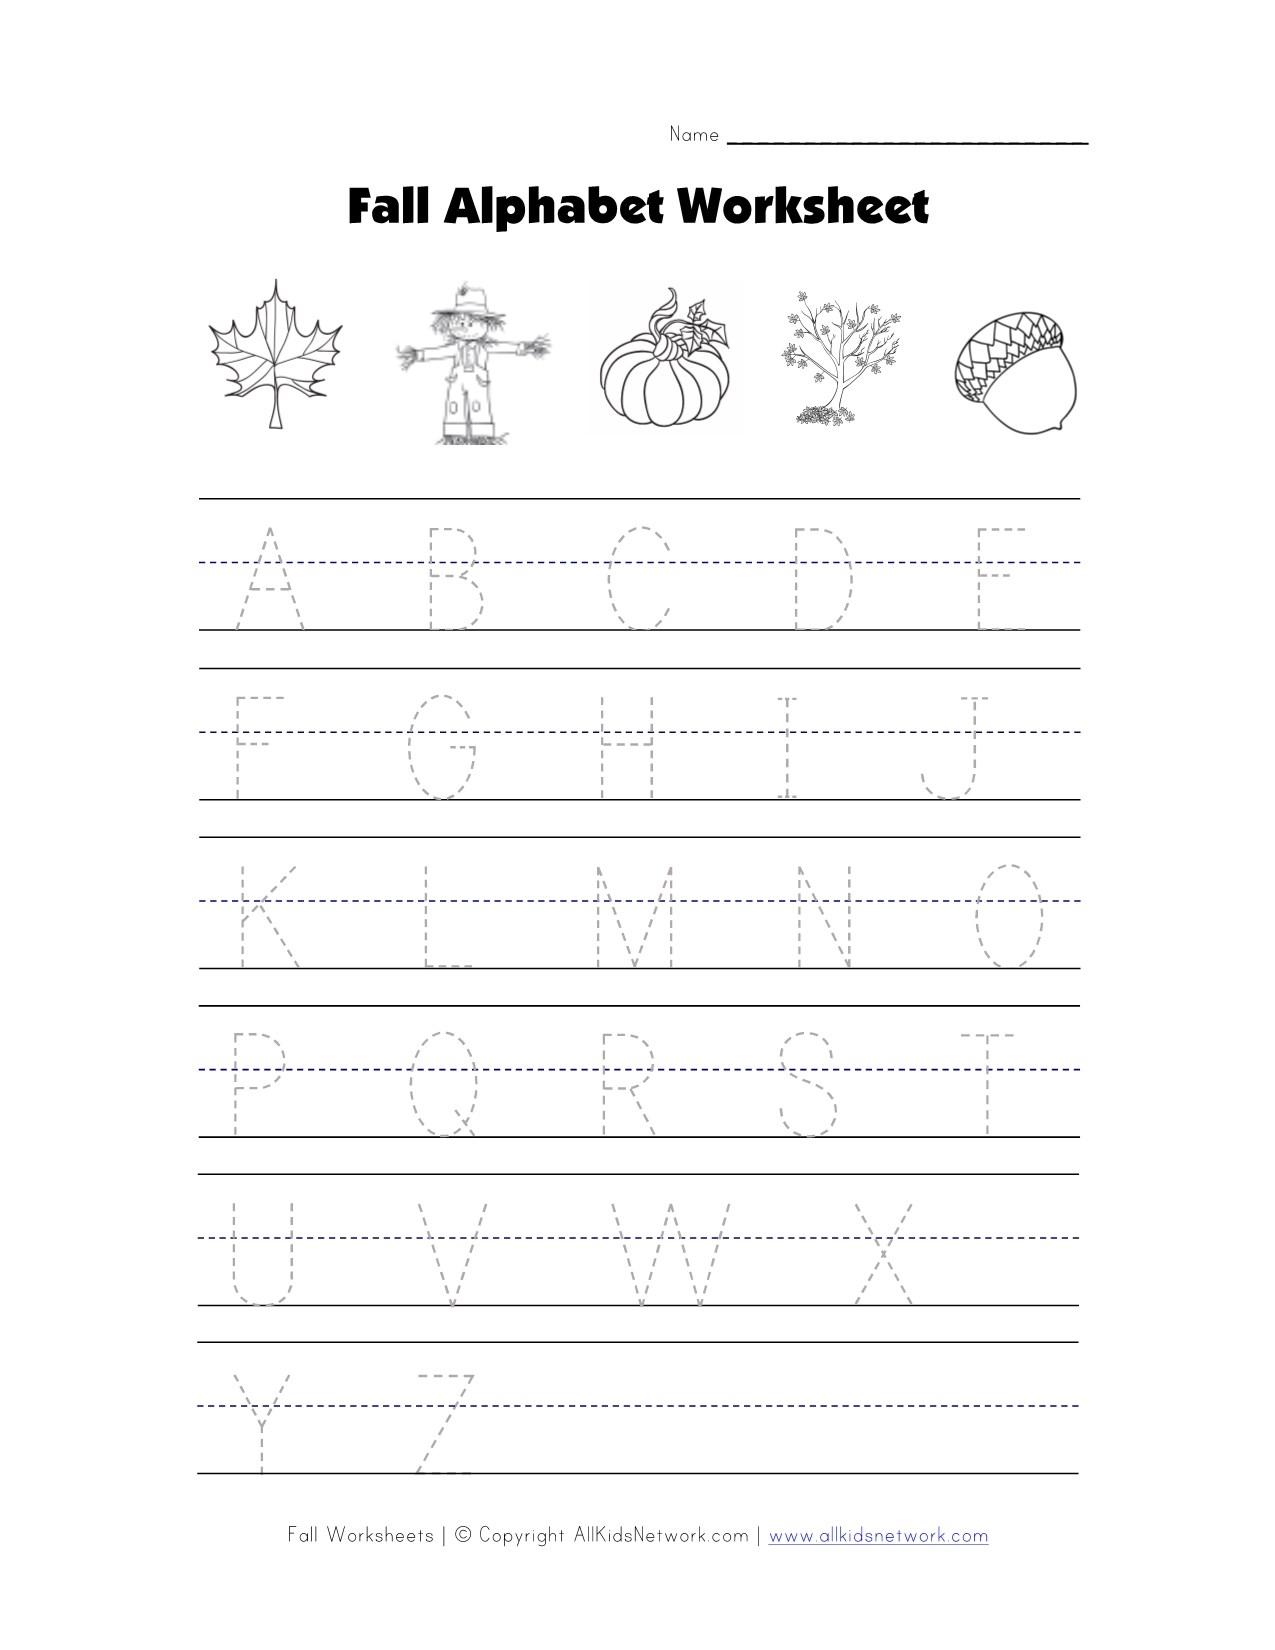 tzoid tracing worksheets for preschool tzoid best free printable worksheets. Black Bedroom Furniture Sets. Home Design Ideas